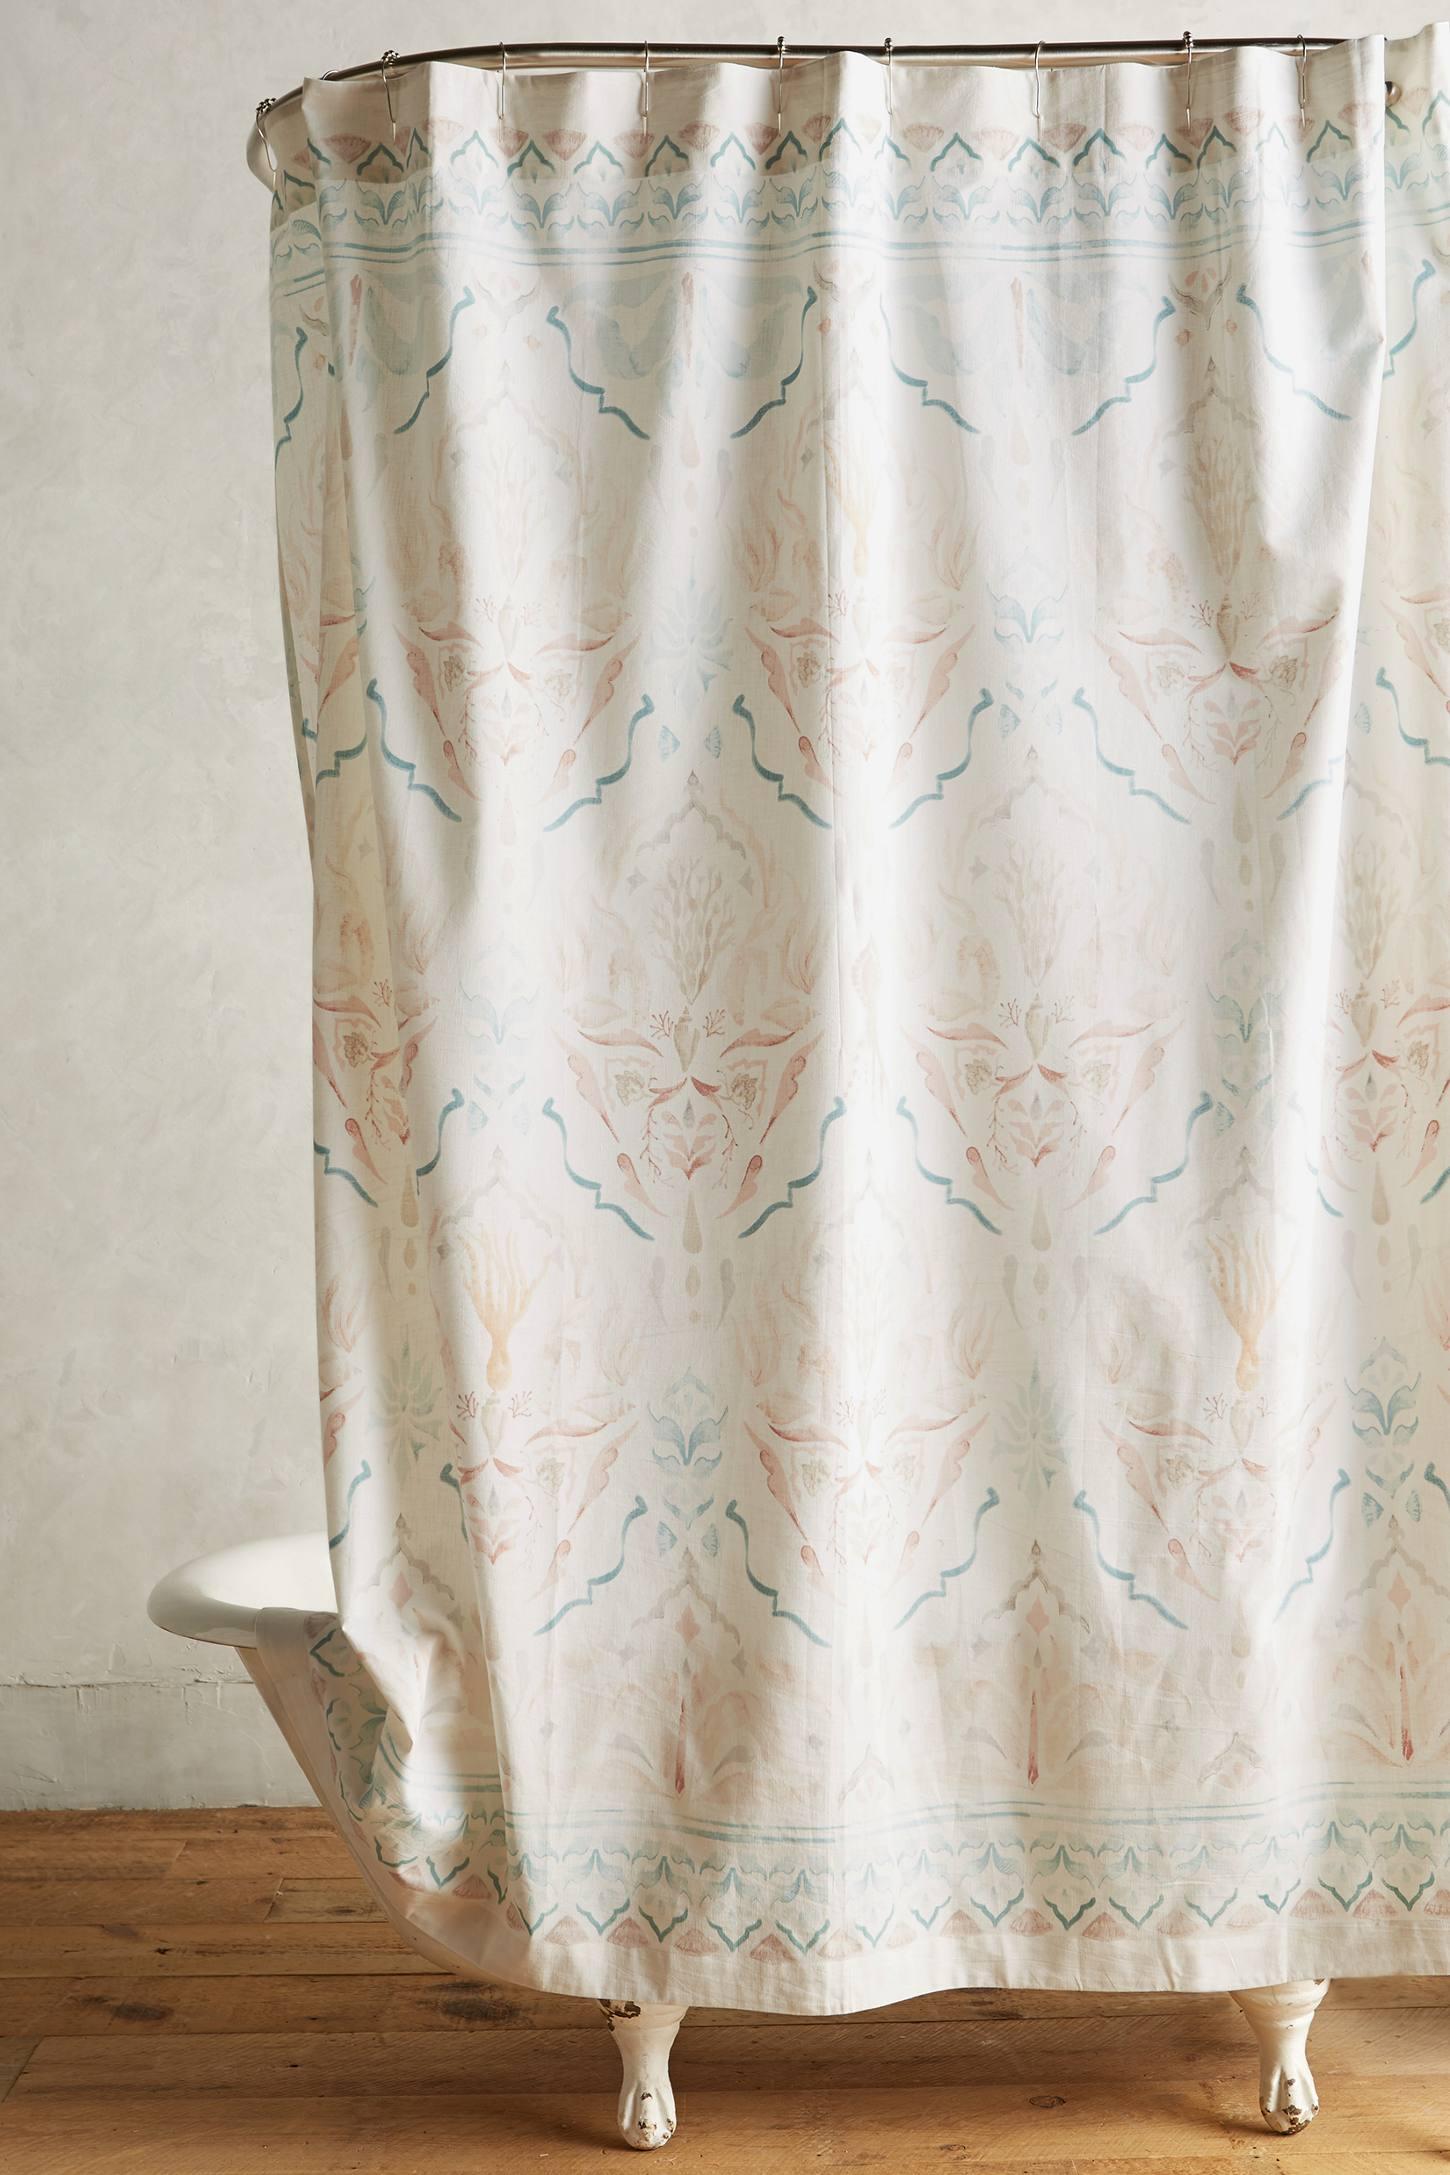 Anthropologie floral shower curtain - Emmelot Shower Curtain Anthropologie